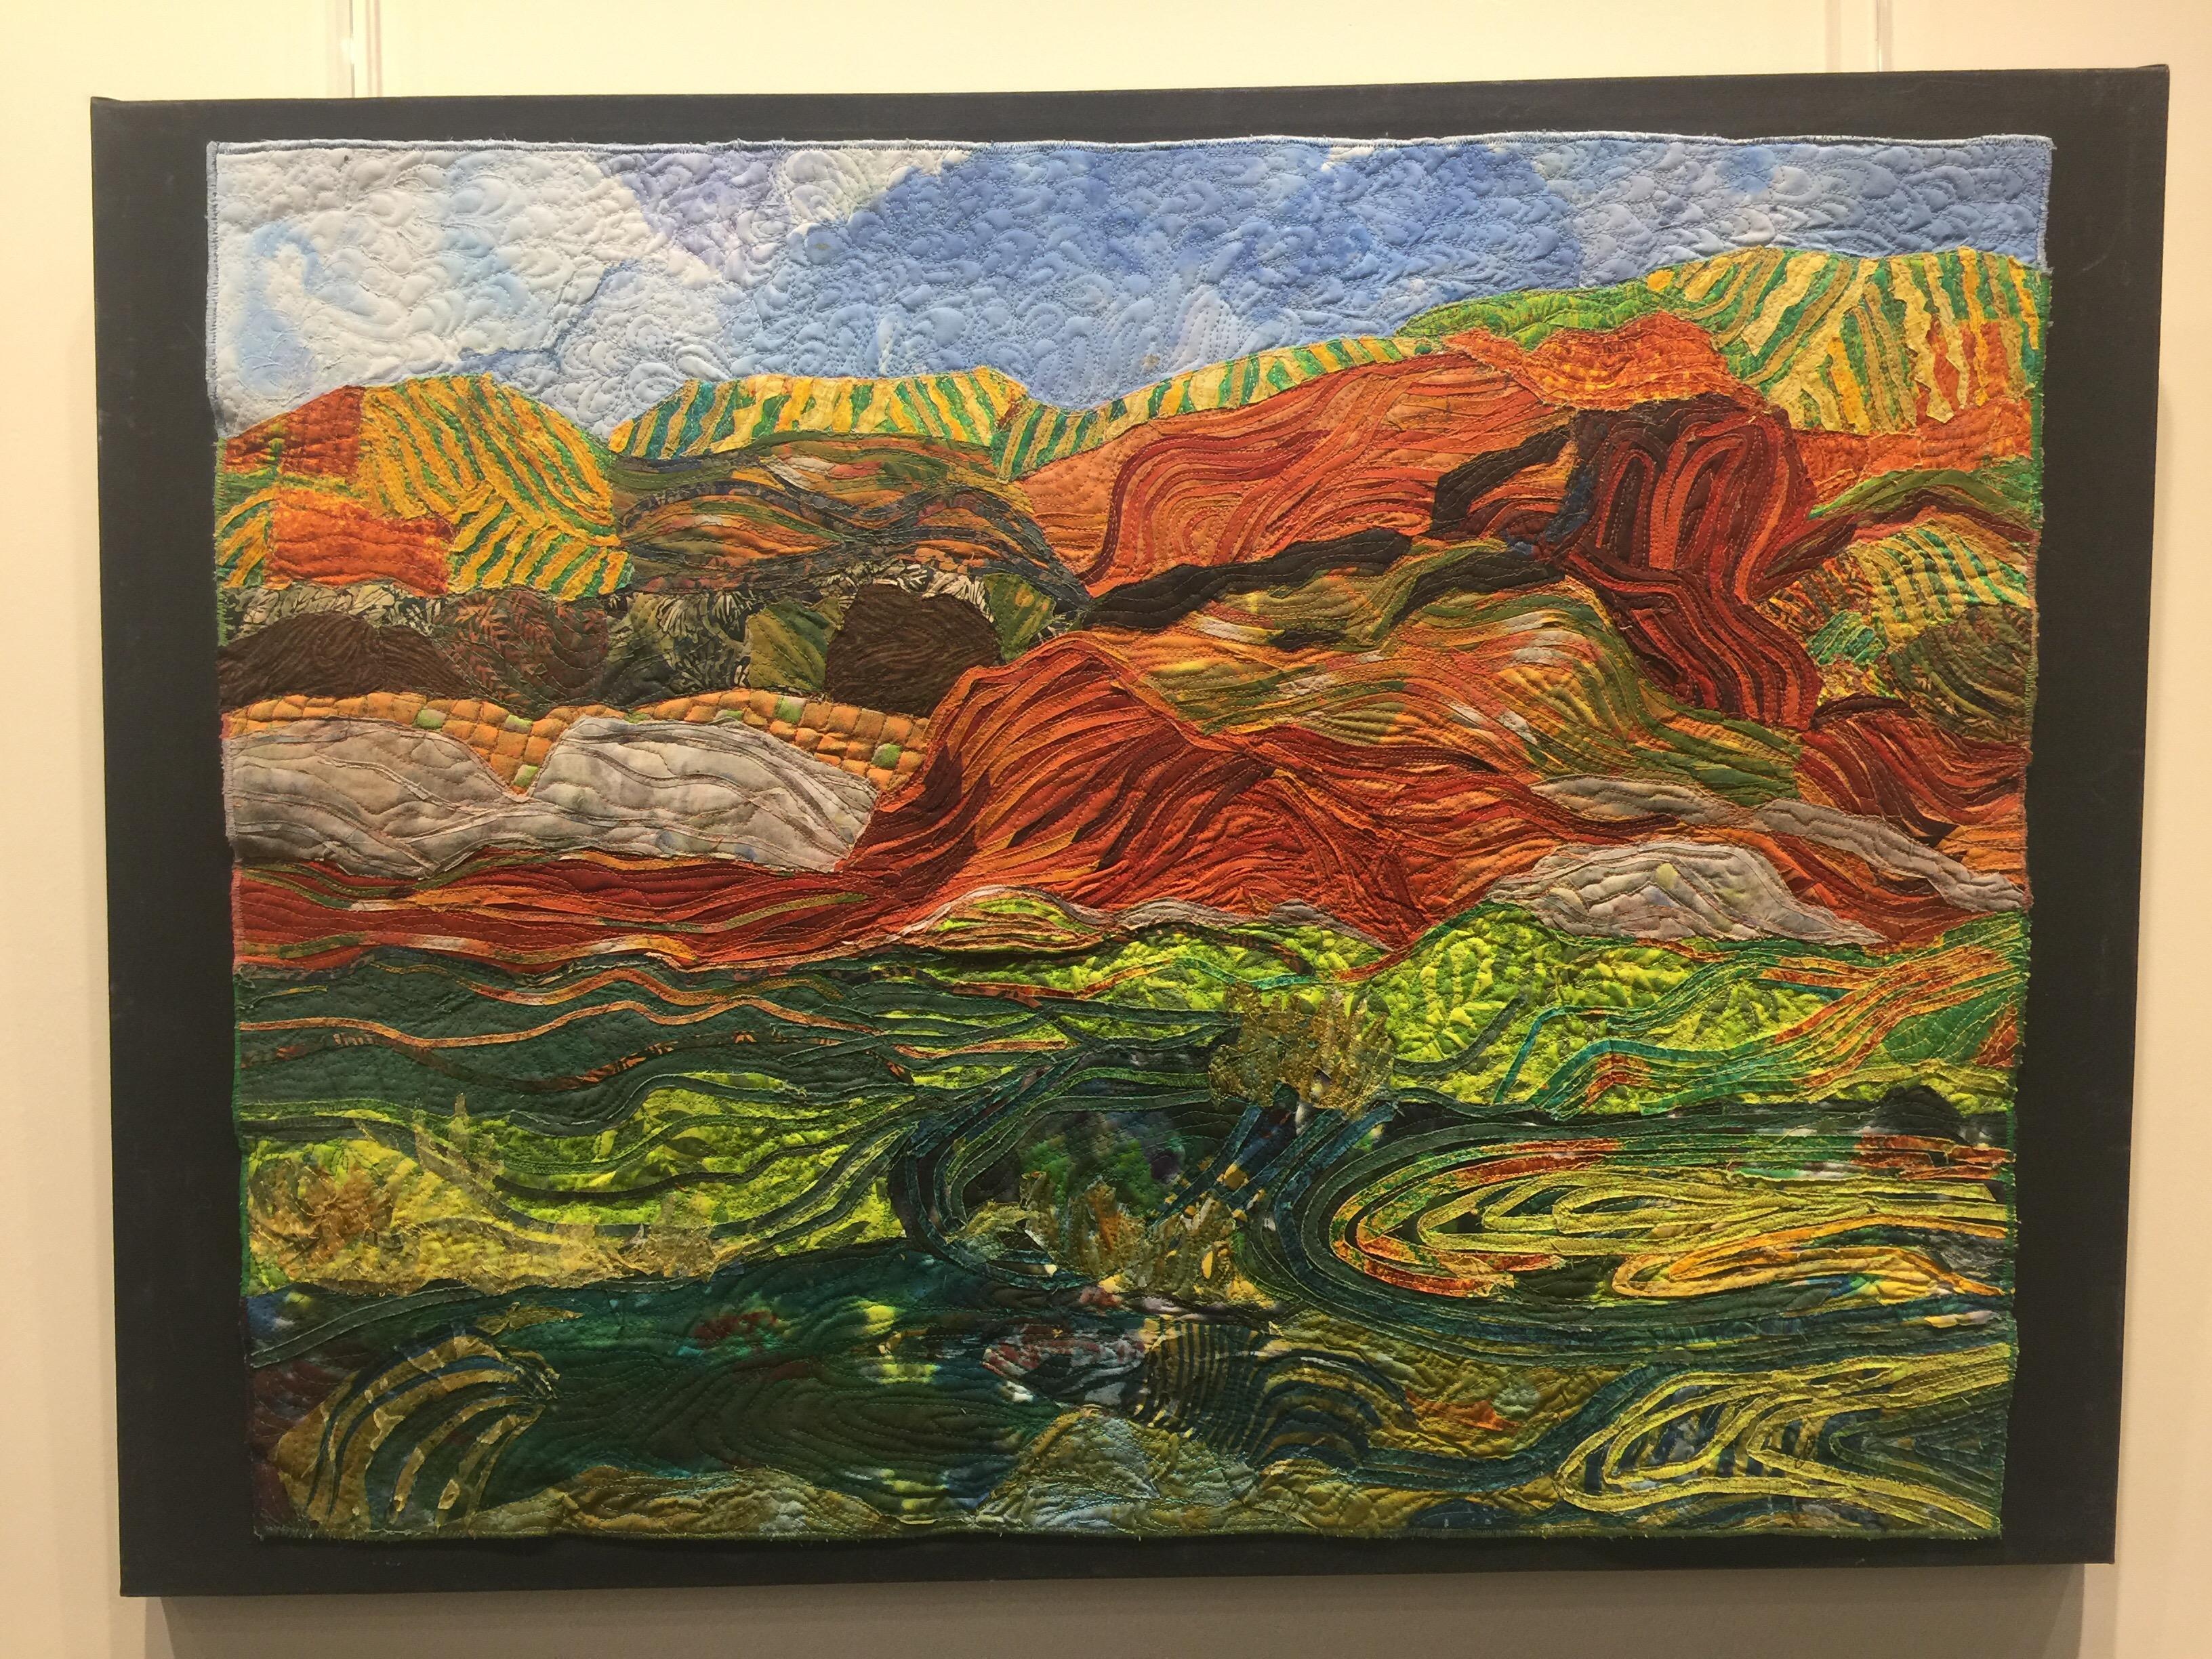 Rocky Mountain Quilt Museum – Fellow Quilter : rocky mountain quilt museum - Adamdwight.com